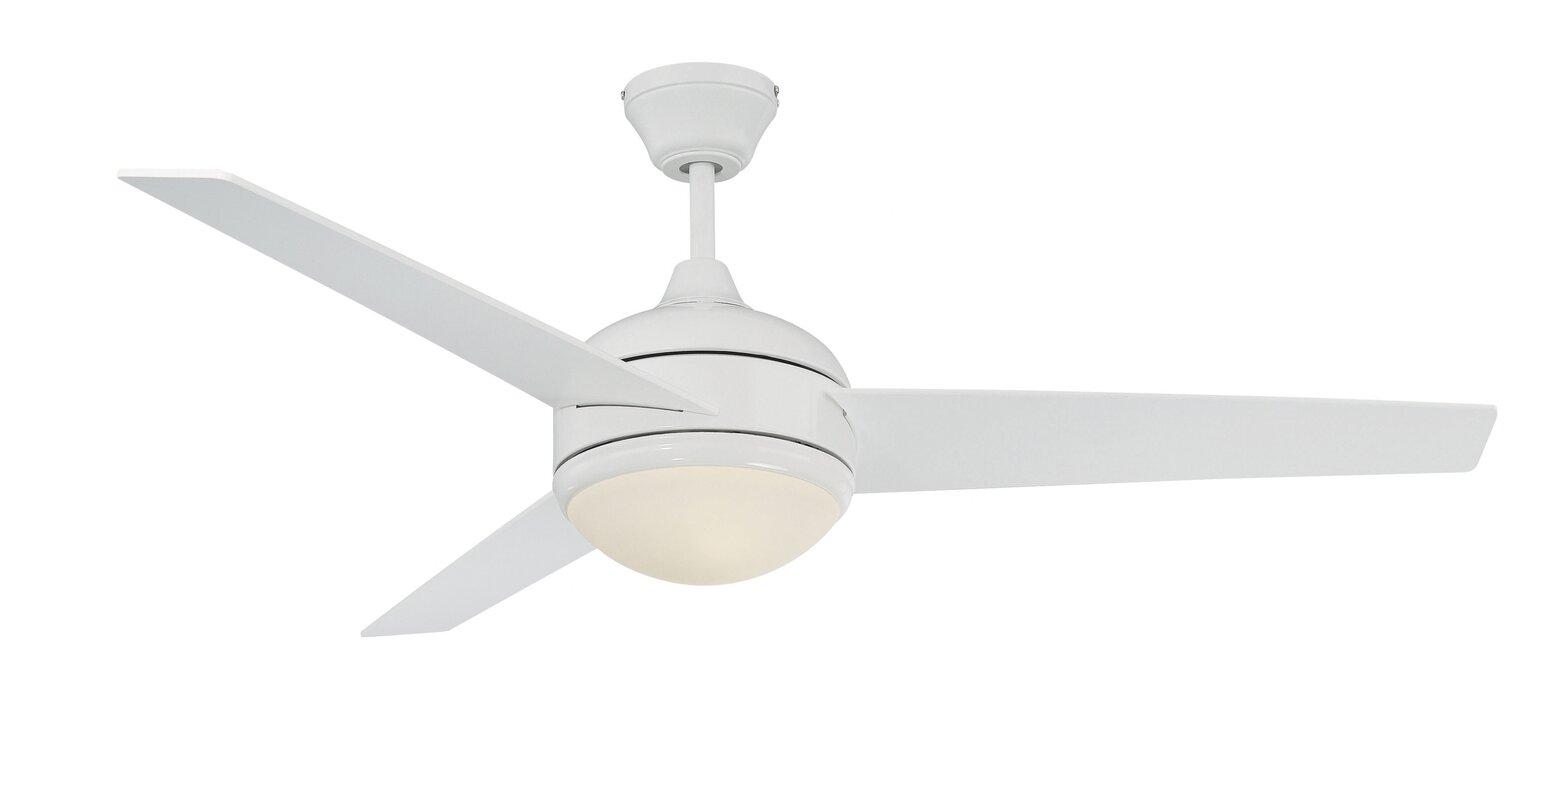 concord fans  skylark blade ceiling fan with remote  reviews  - defaultname